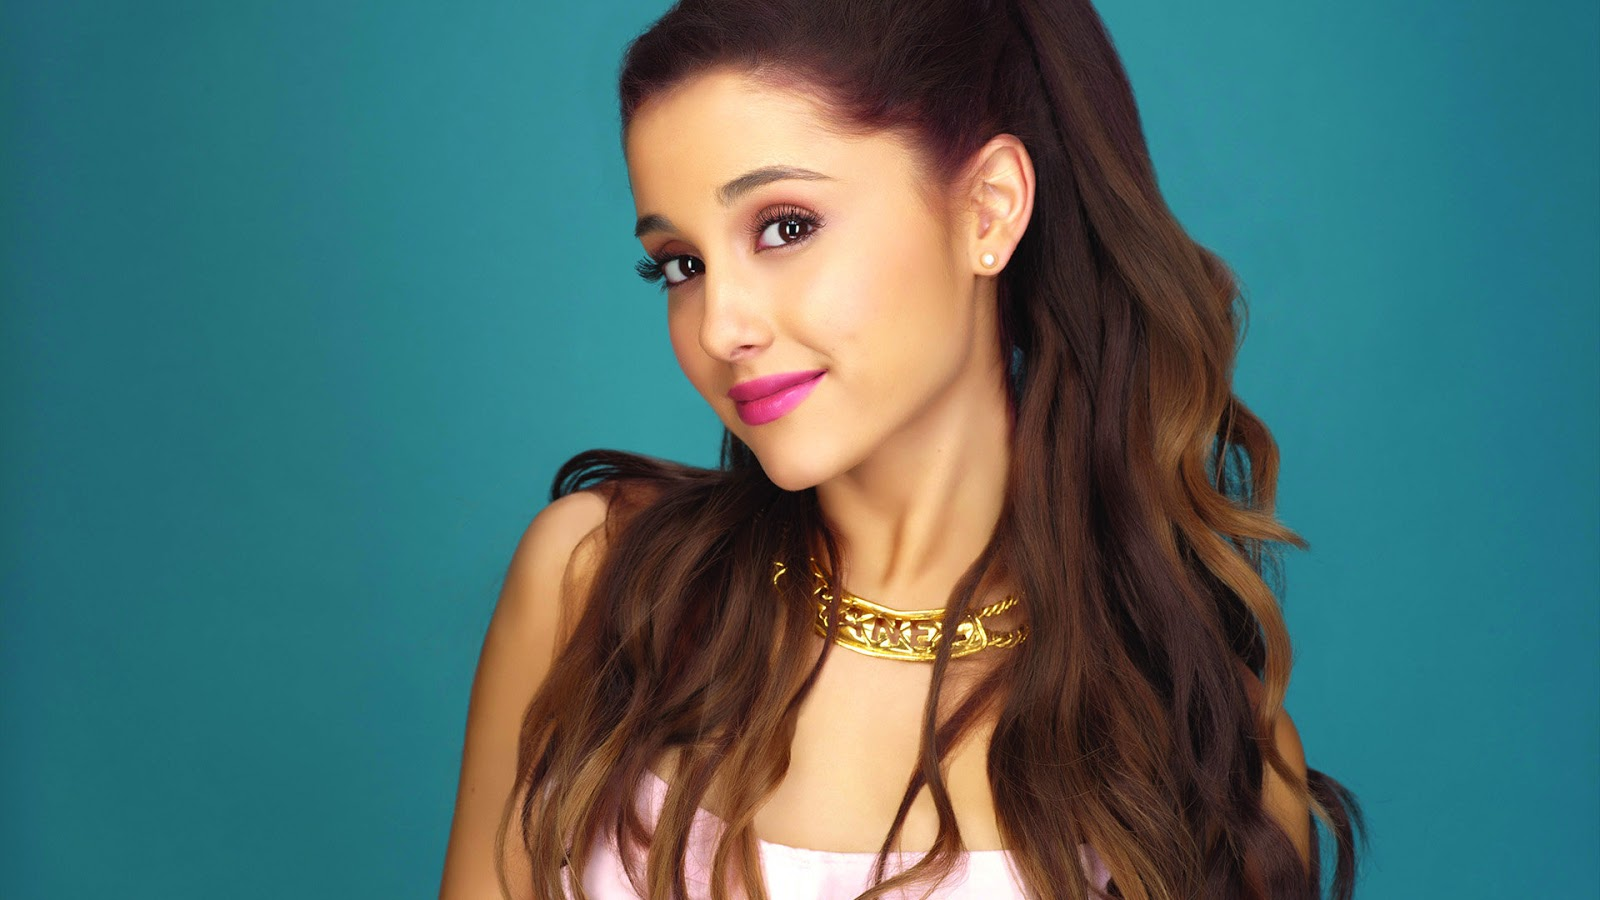 Lyric Lagu Ariana Grande